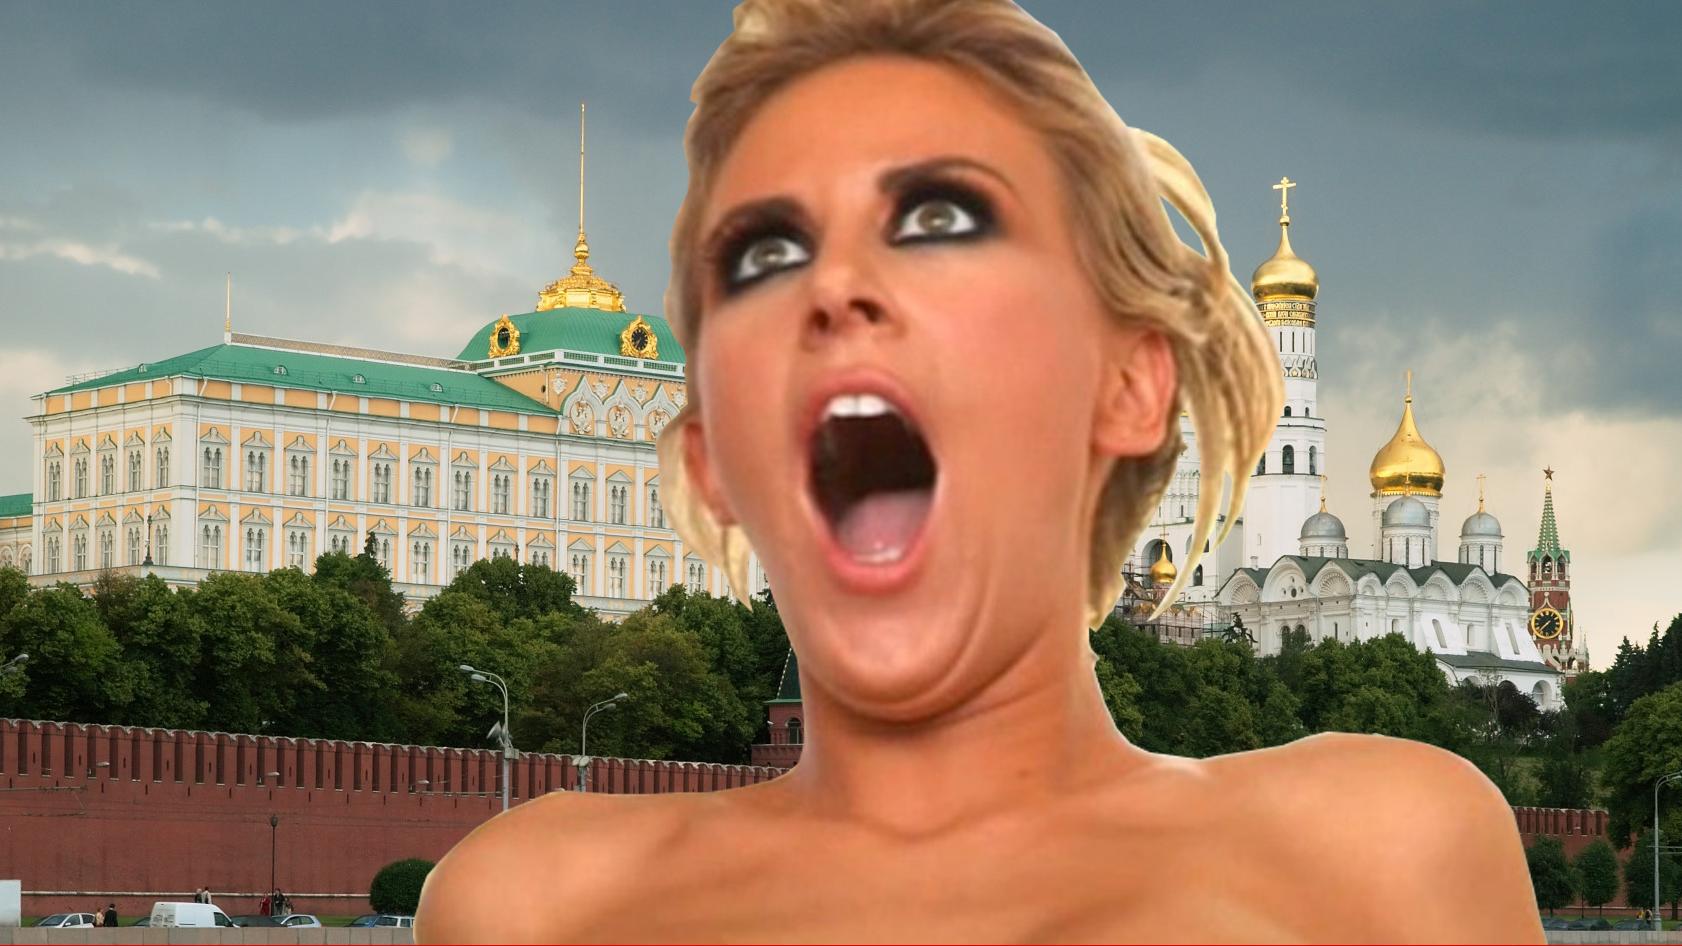 Rusland blokkeert pornosites Pornhub en YouPorn